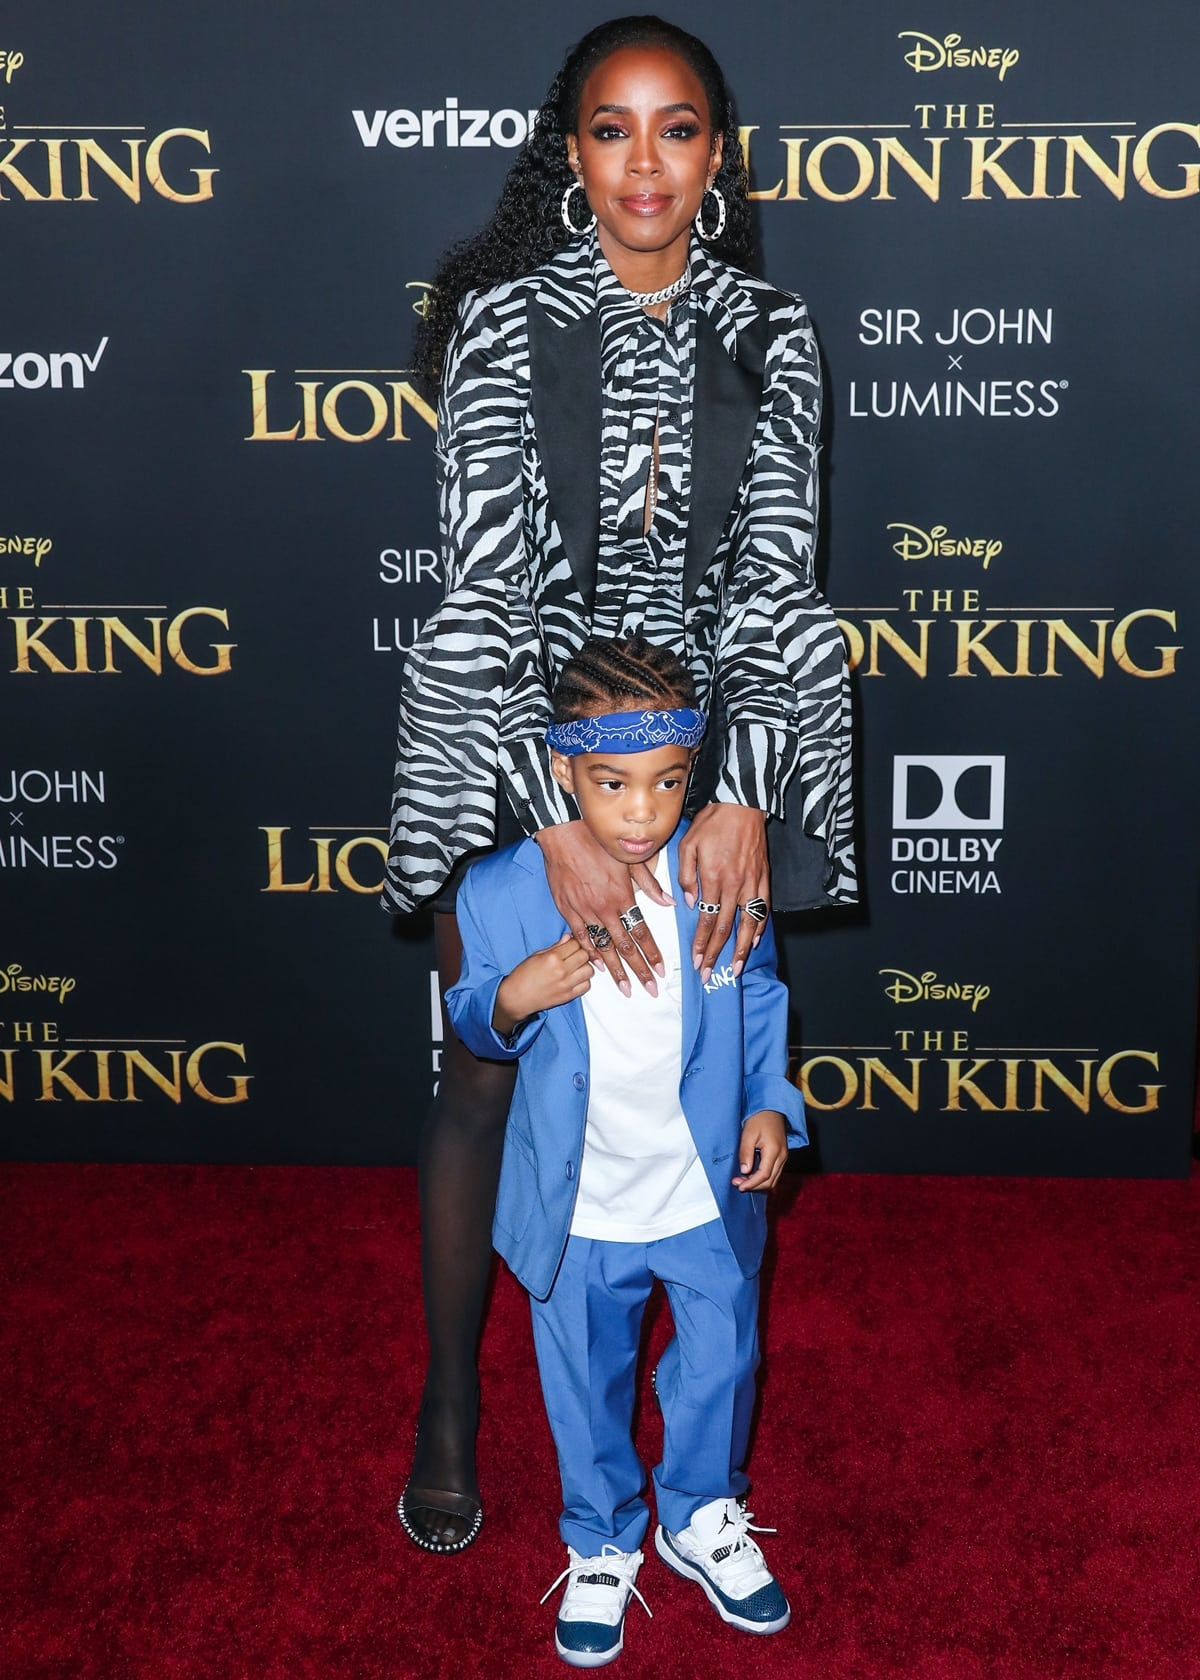 Kelly Rowland's son Titan Jewell Weatherspoon was born on November 4, 2014